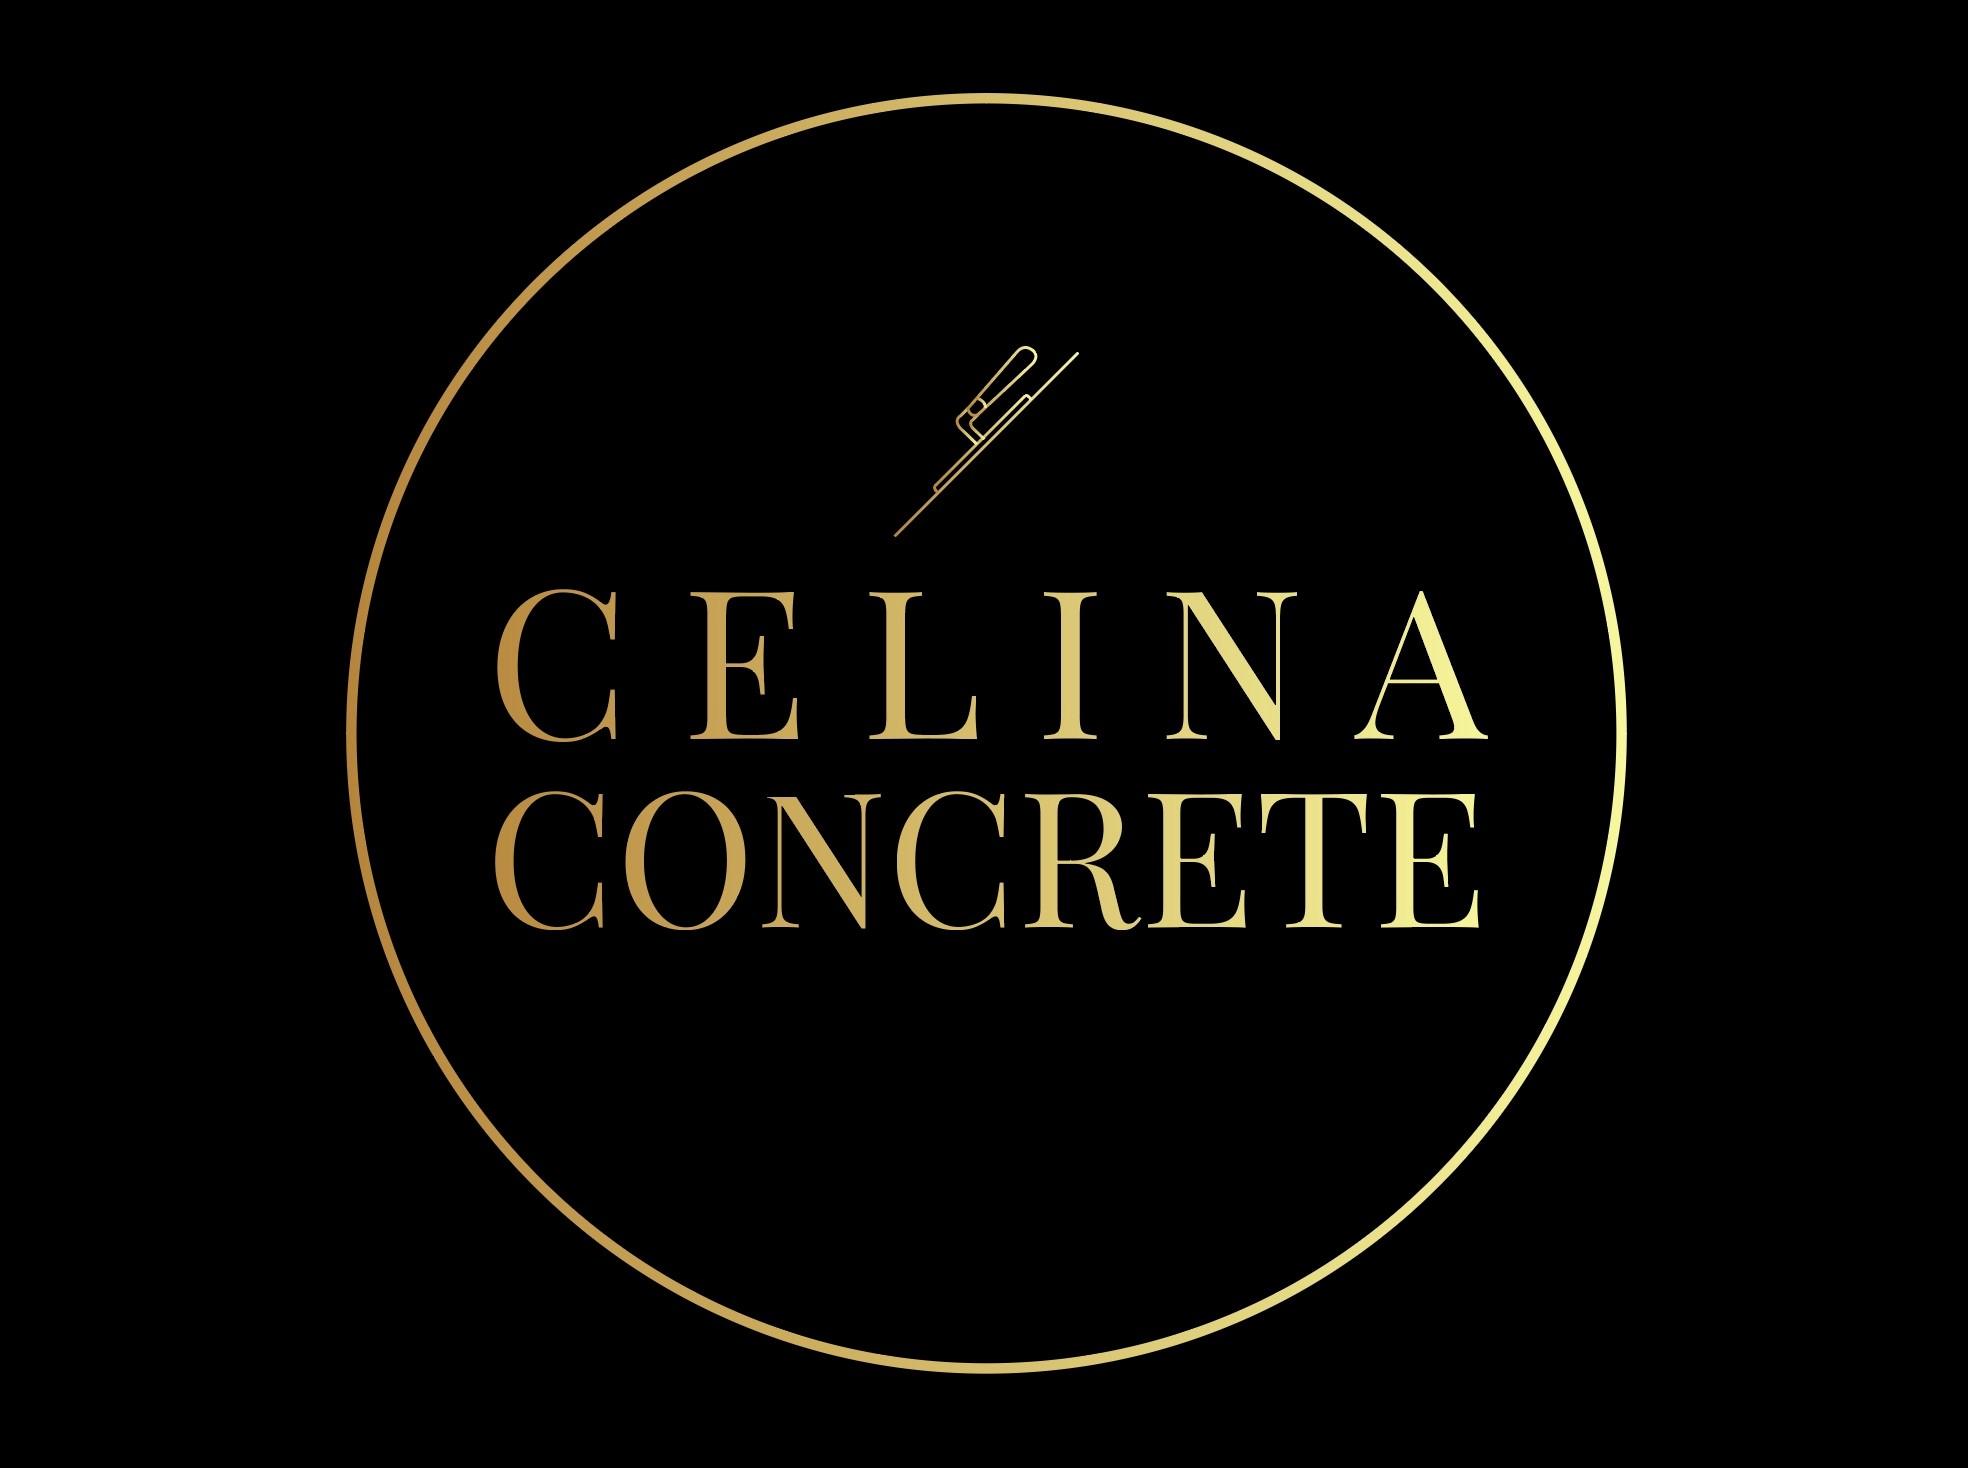 Celina Concrete